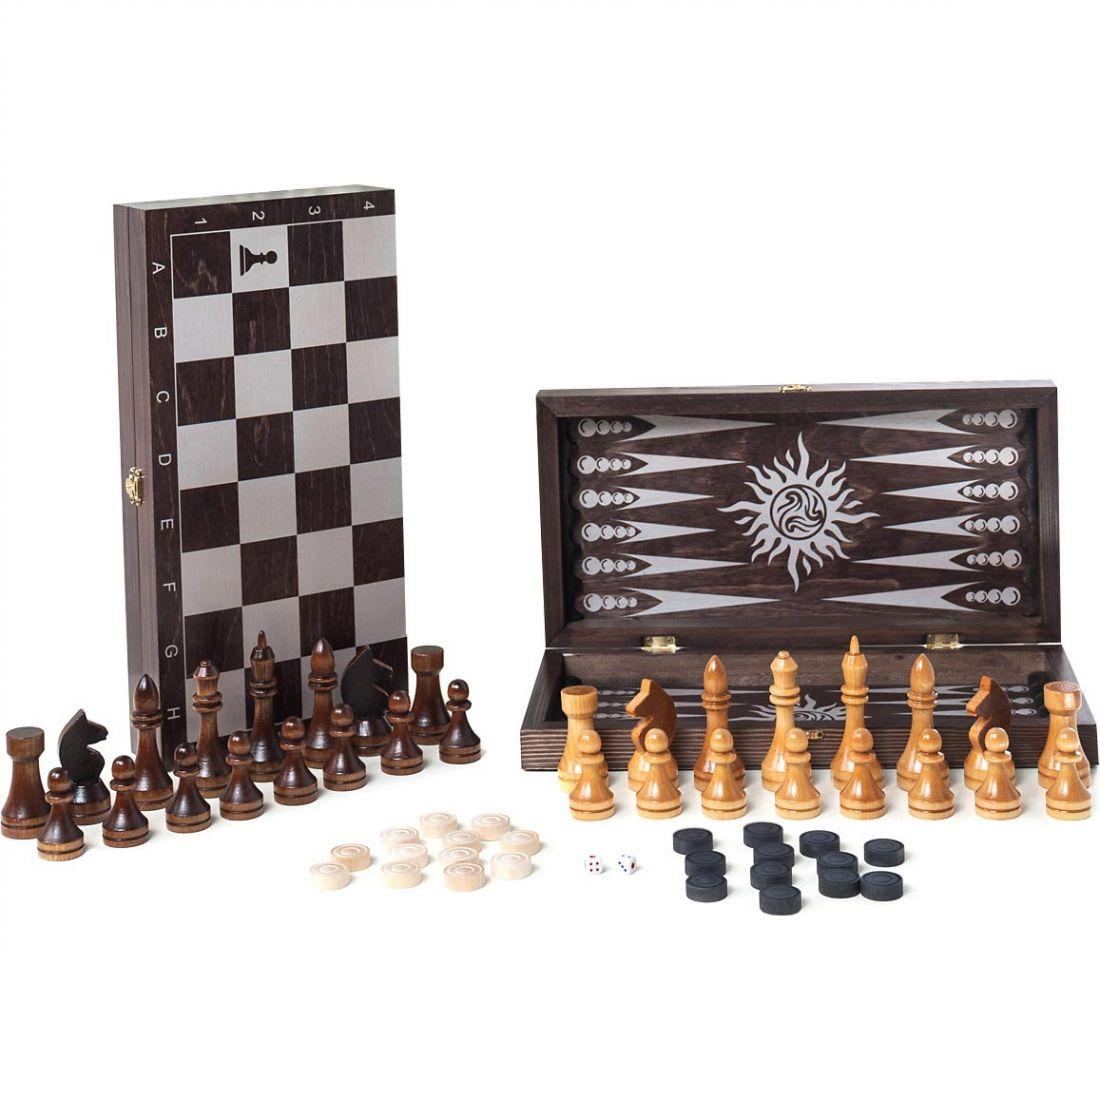 Набор 3 в 1 деревянный Классика 297-18 (шахматы, шашки, нарды) 40х40см